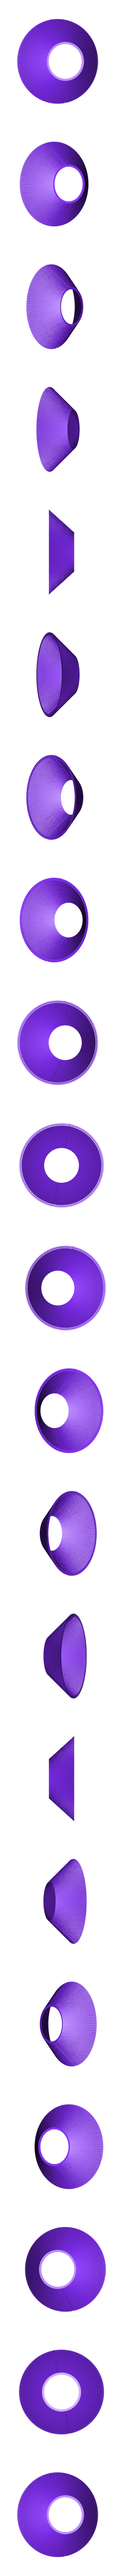 roof_lev2.stl Download free STL file The Crannog • 3D printable template, Earsling